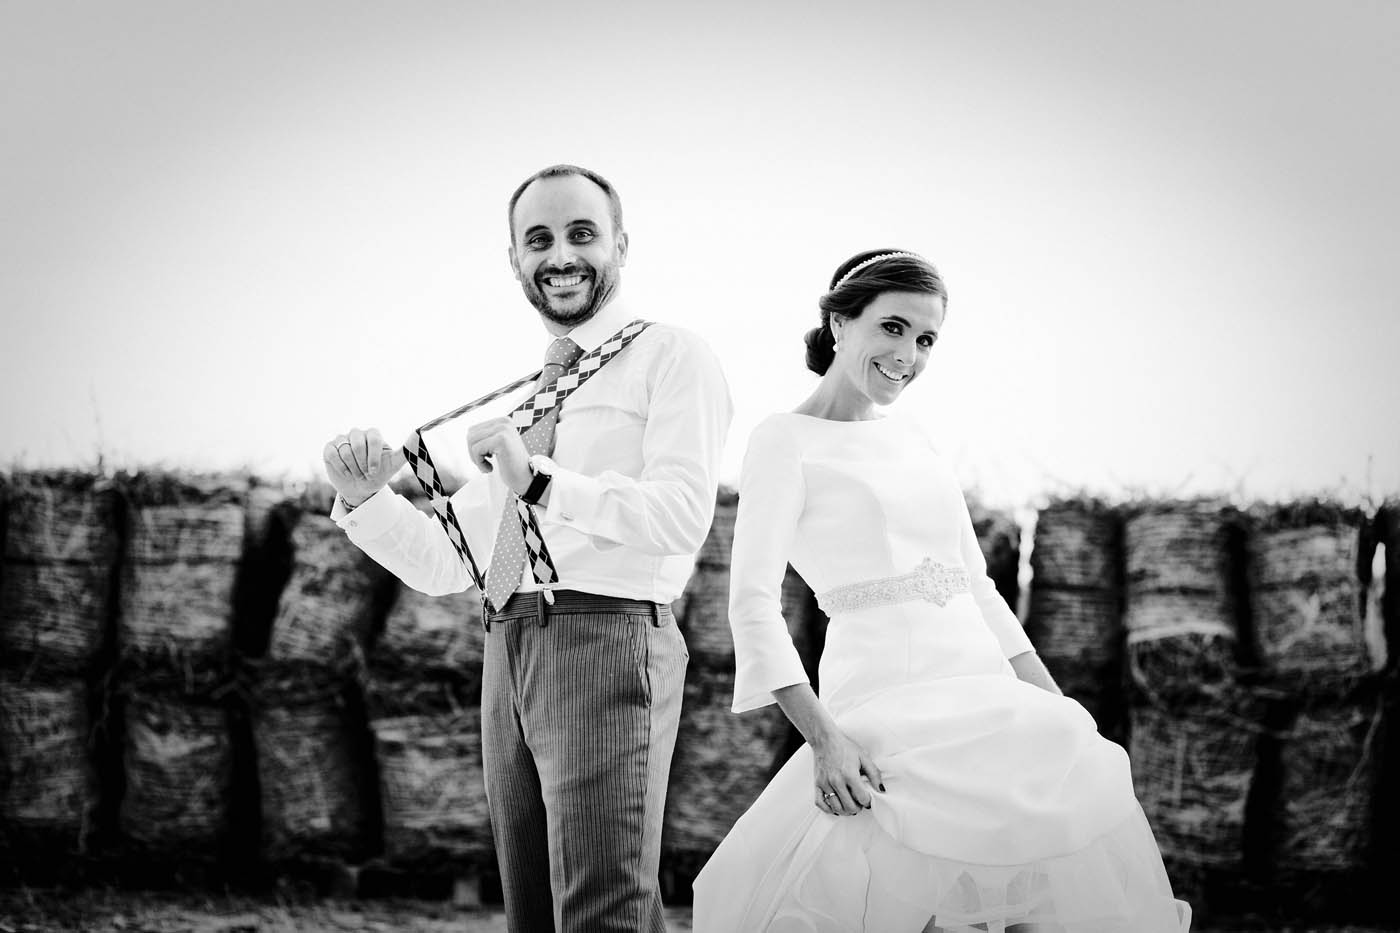 boda raquel guille-hotel eguren ugarte -paganos-alava-ivan castillo fotografia (34).jpg